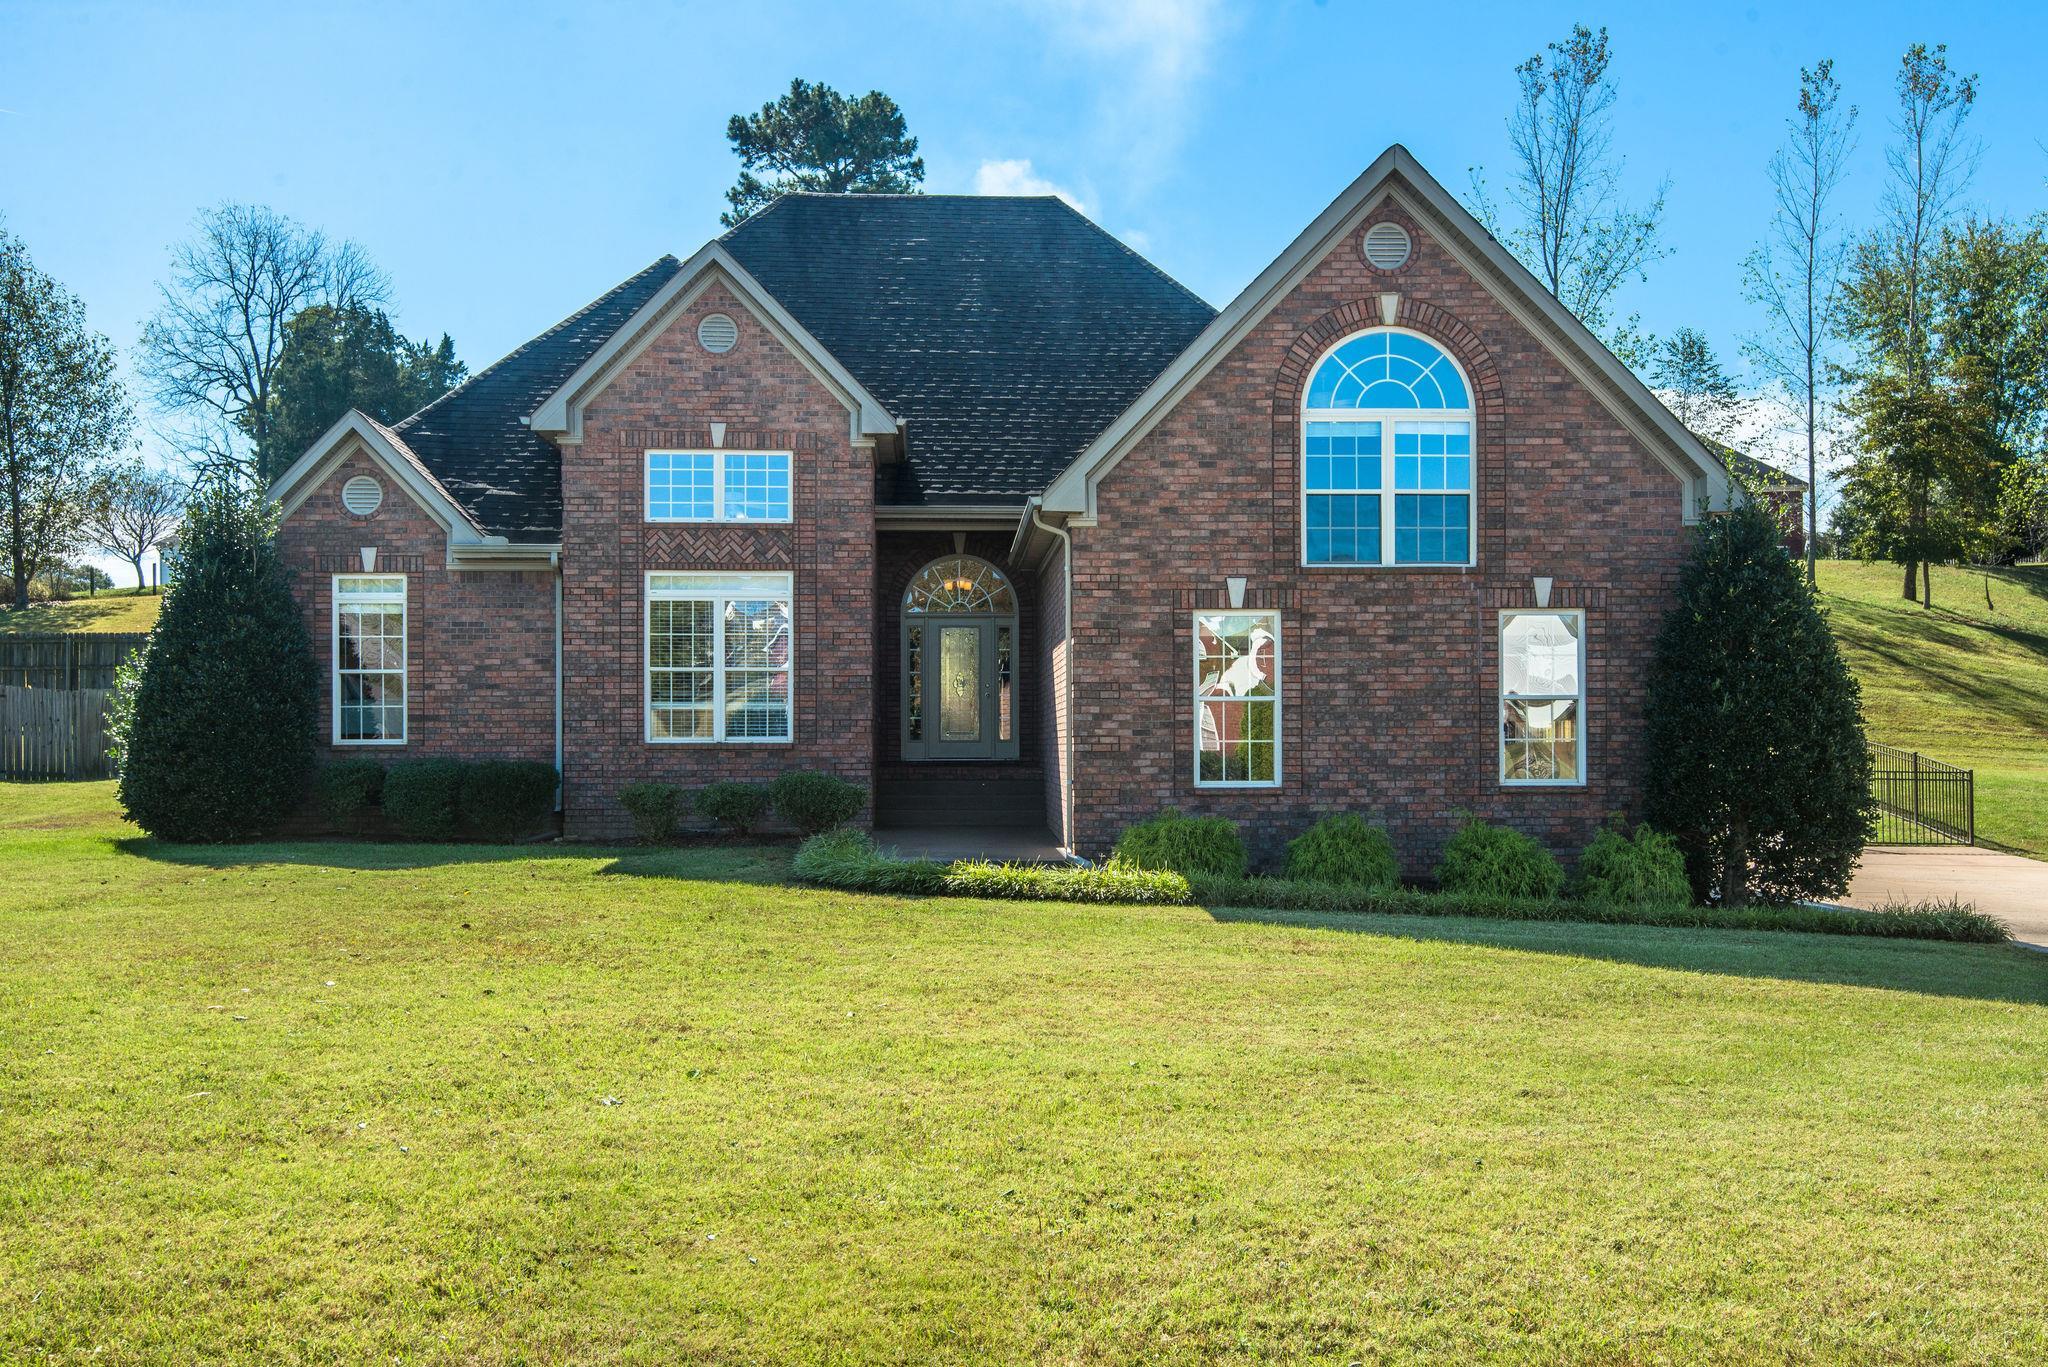 4046 Oak Pointe Dr, Pleasant View, TN 37146 - Pleasant View, TN real estate listing